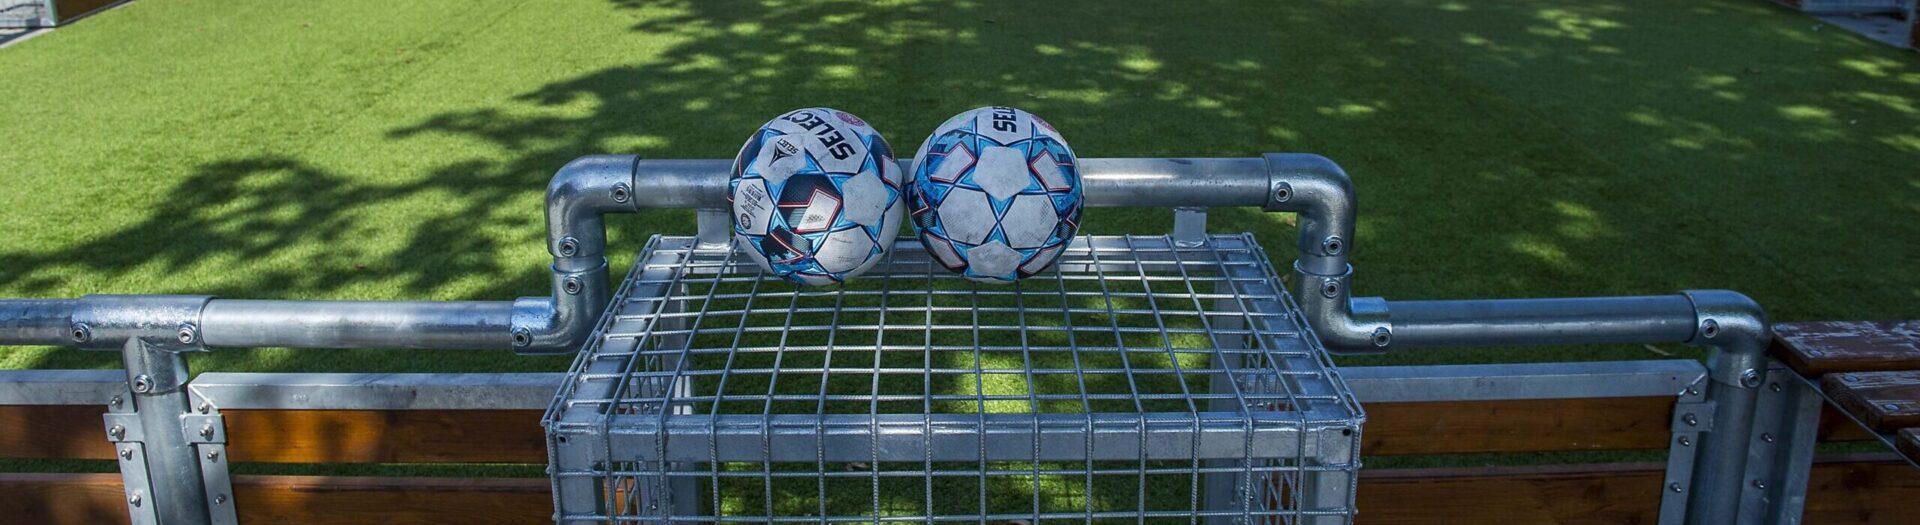 Træningslejr fodbold - De perfekte rammer